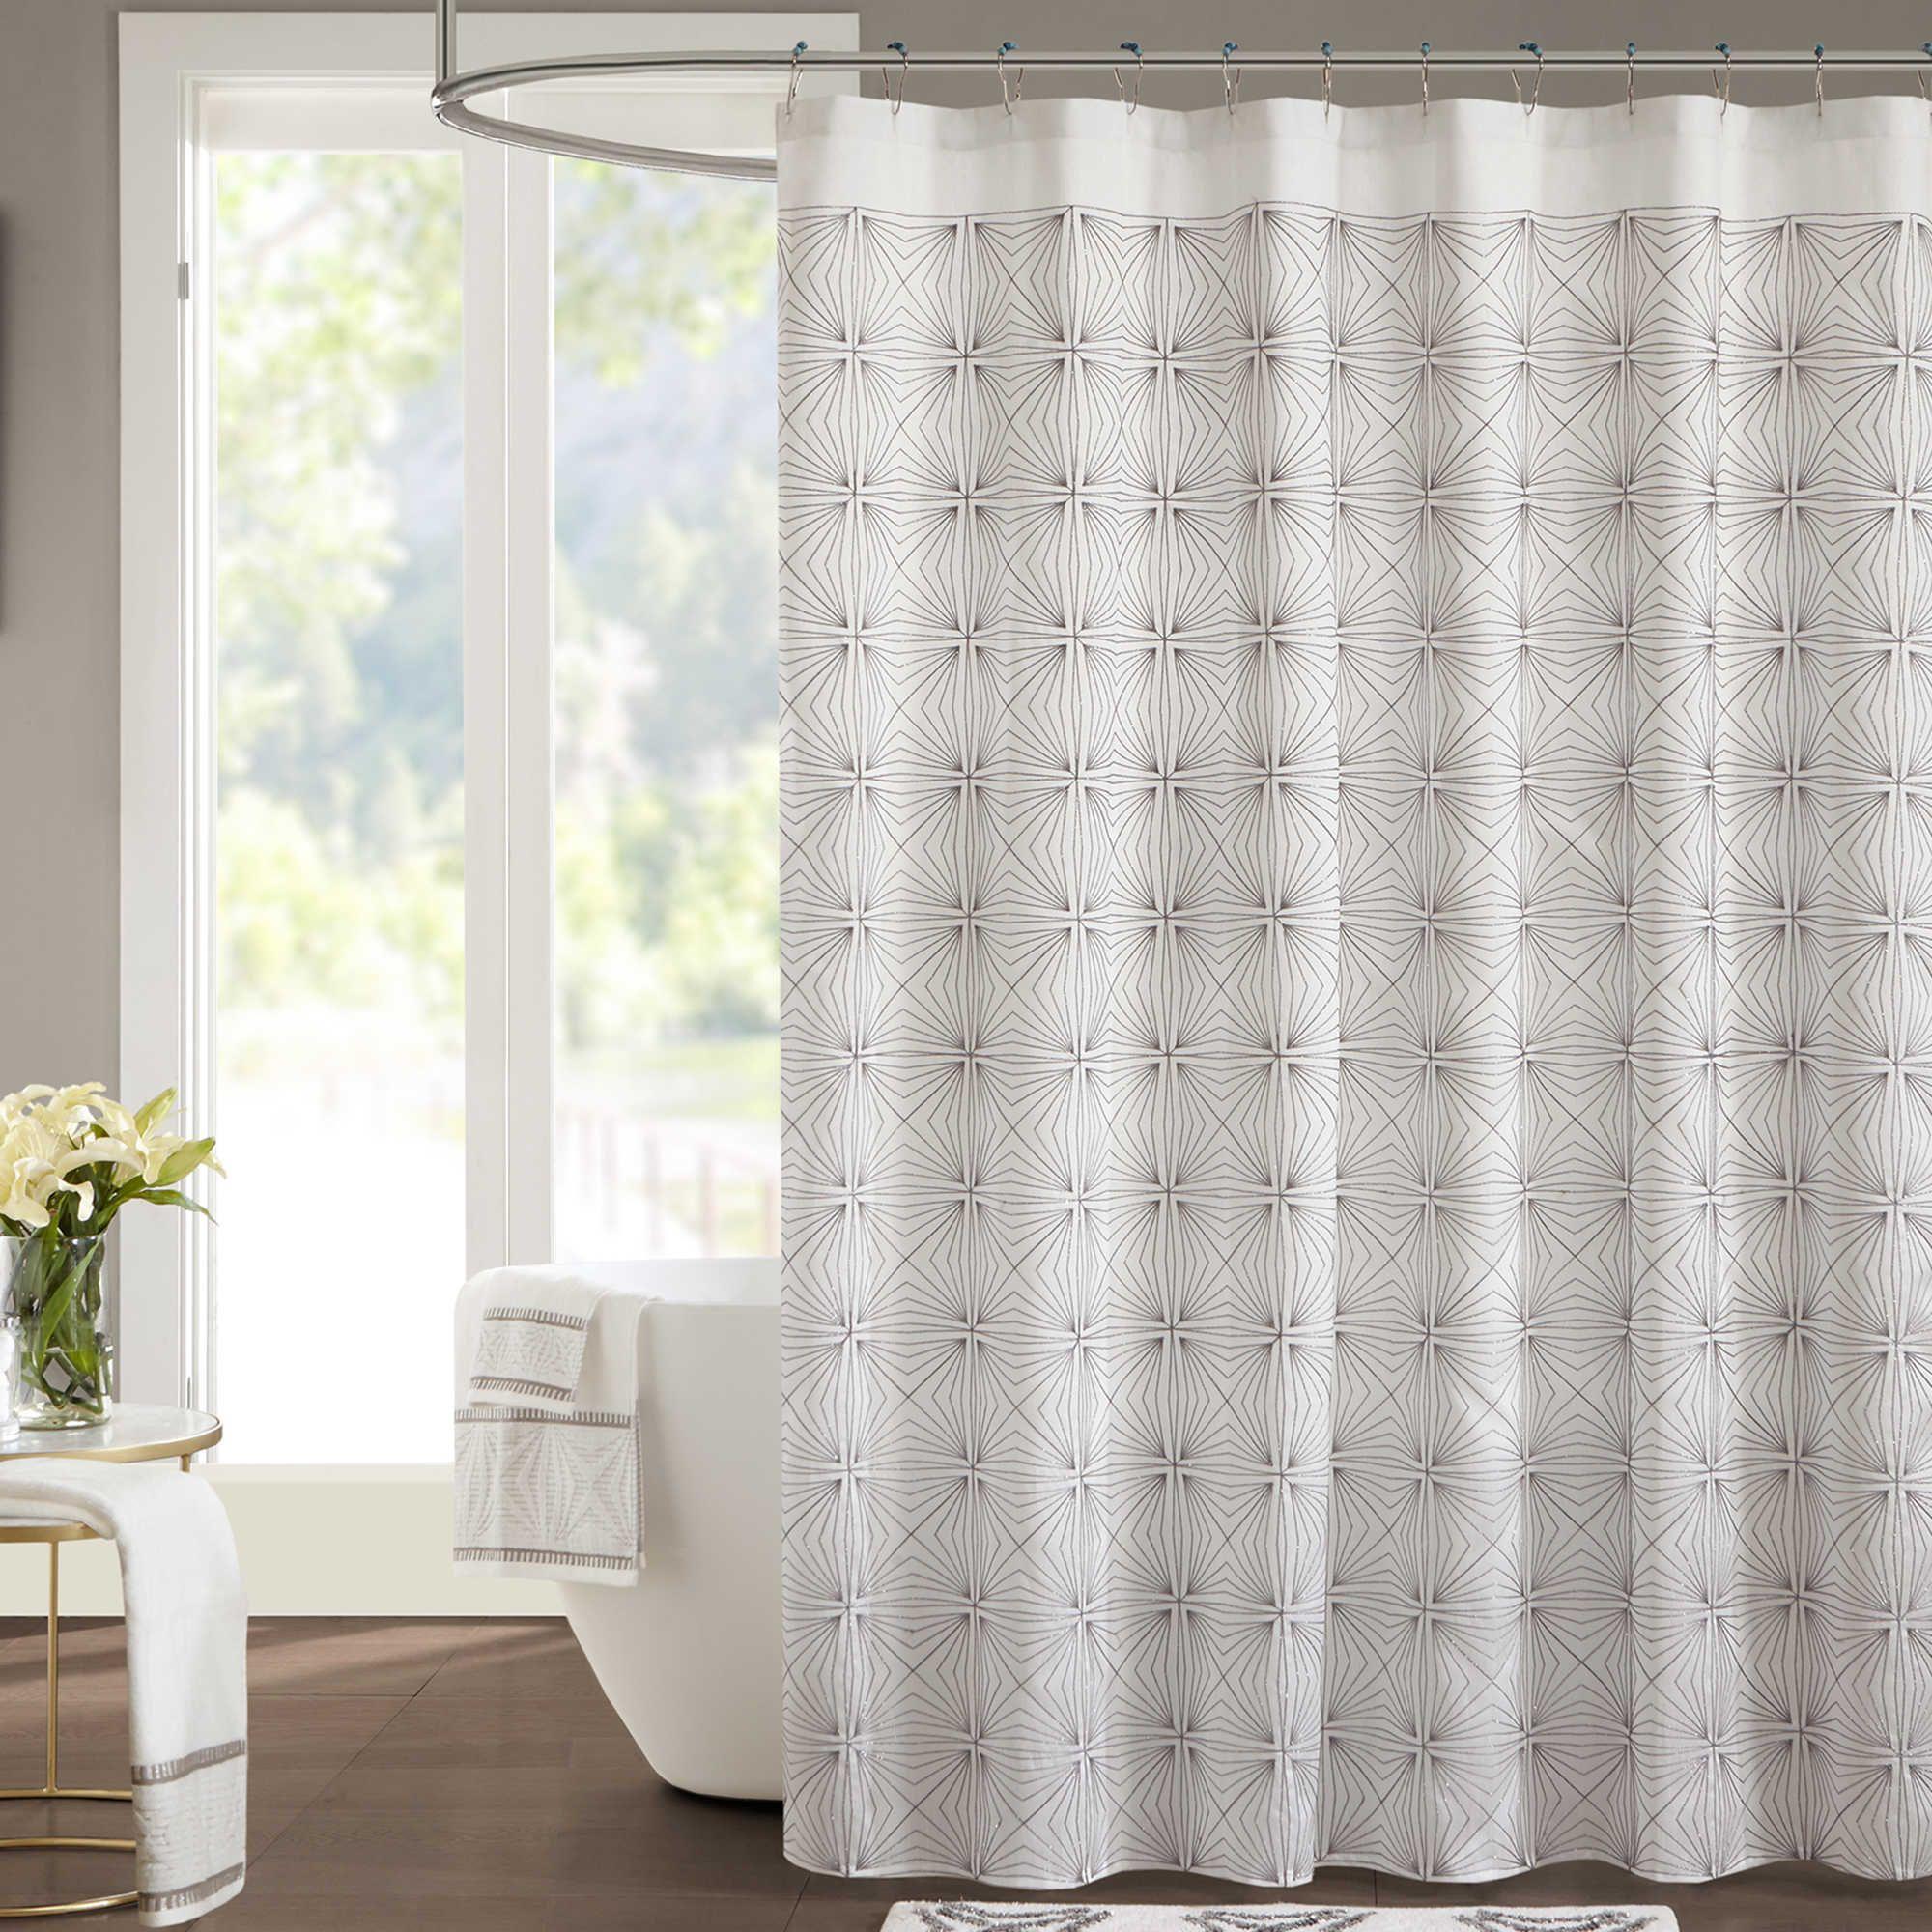 Sinatra silver shower curtain - Jla Coty Shower Curtain